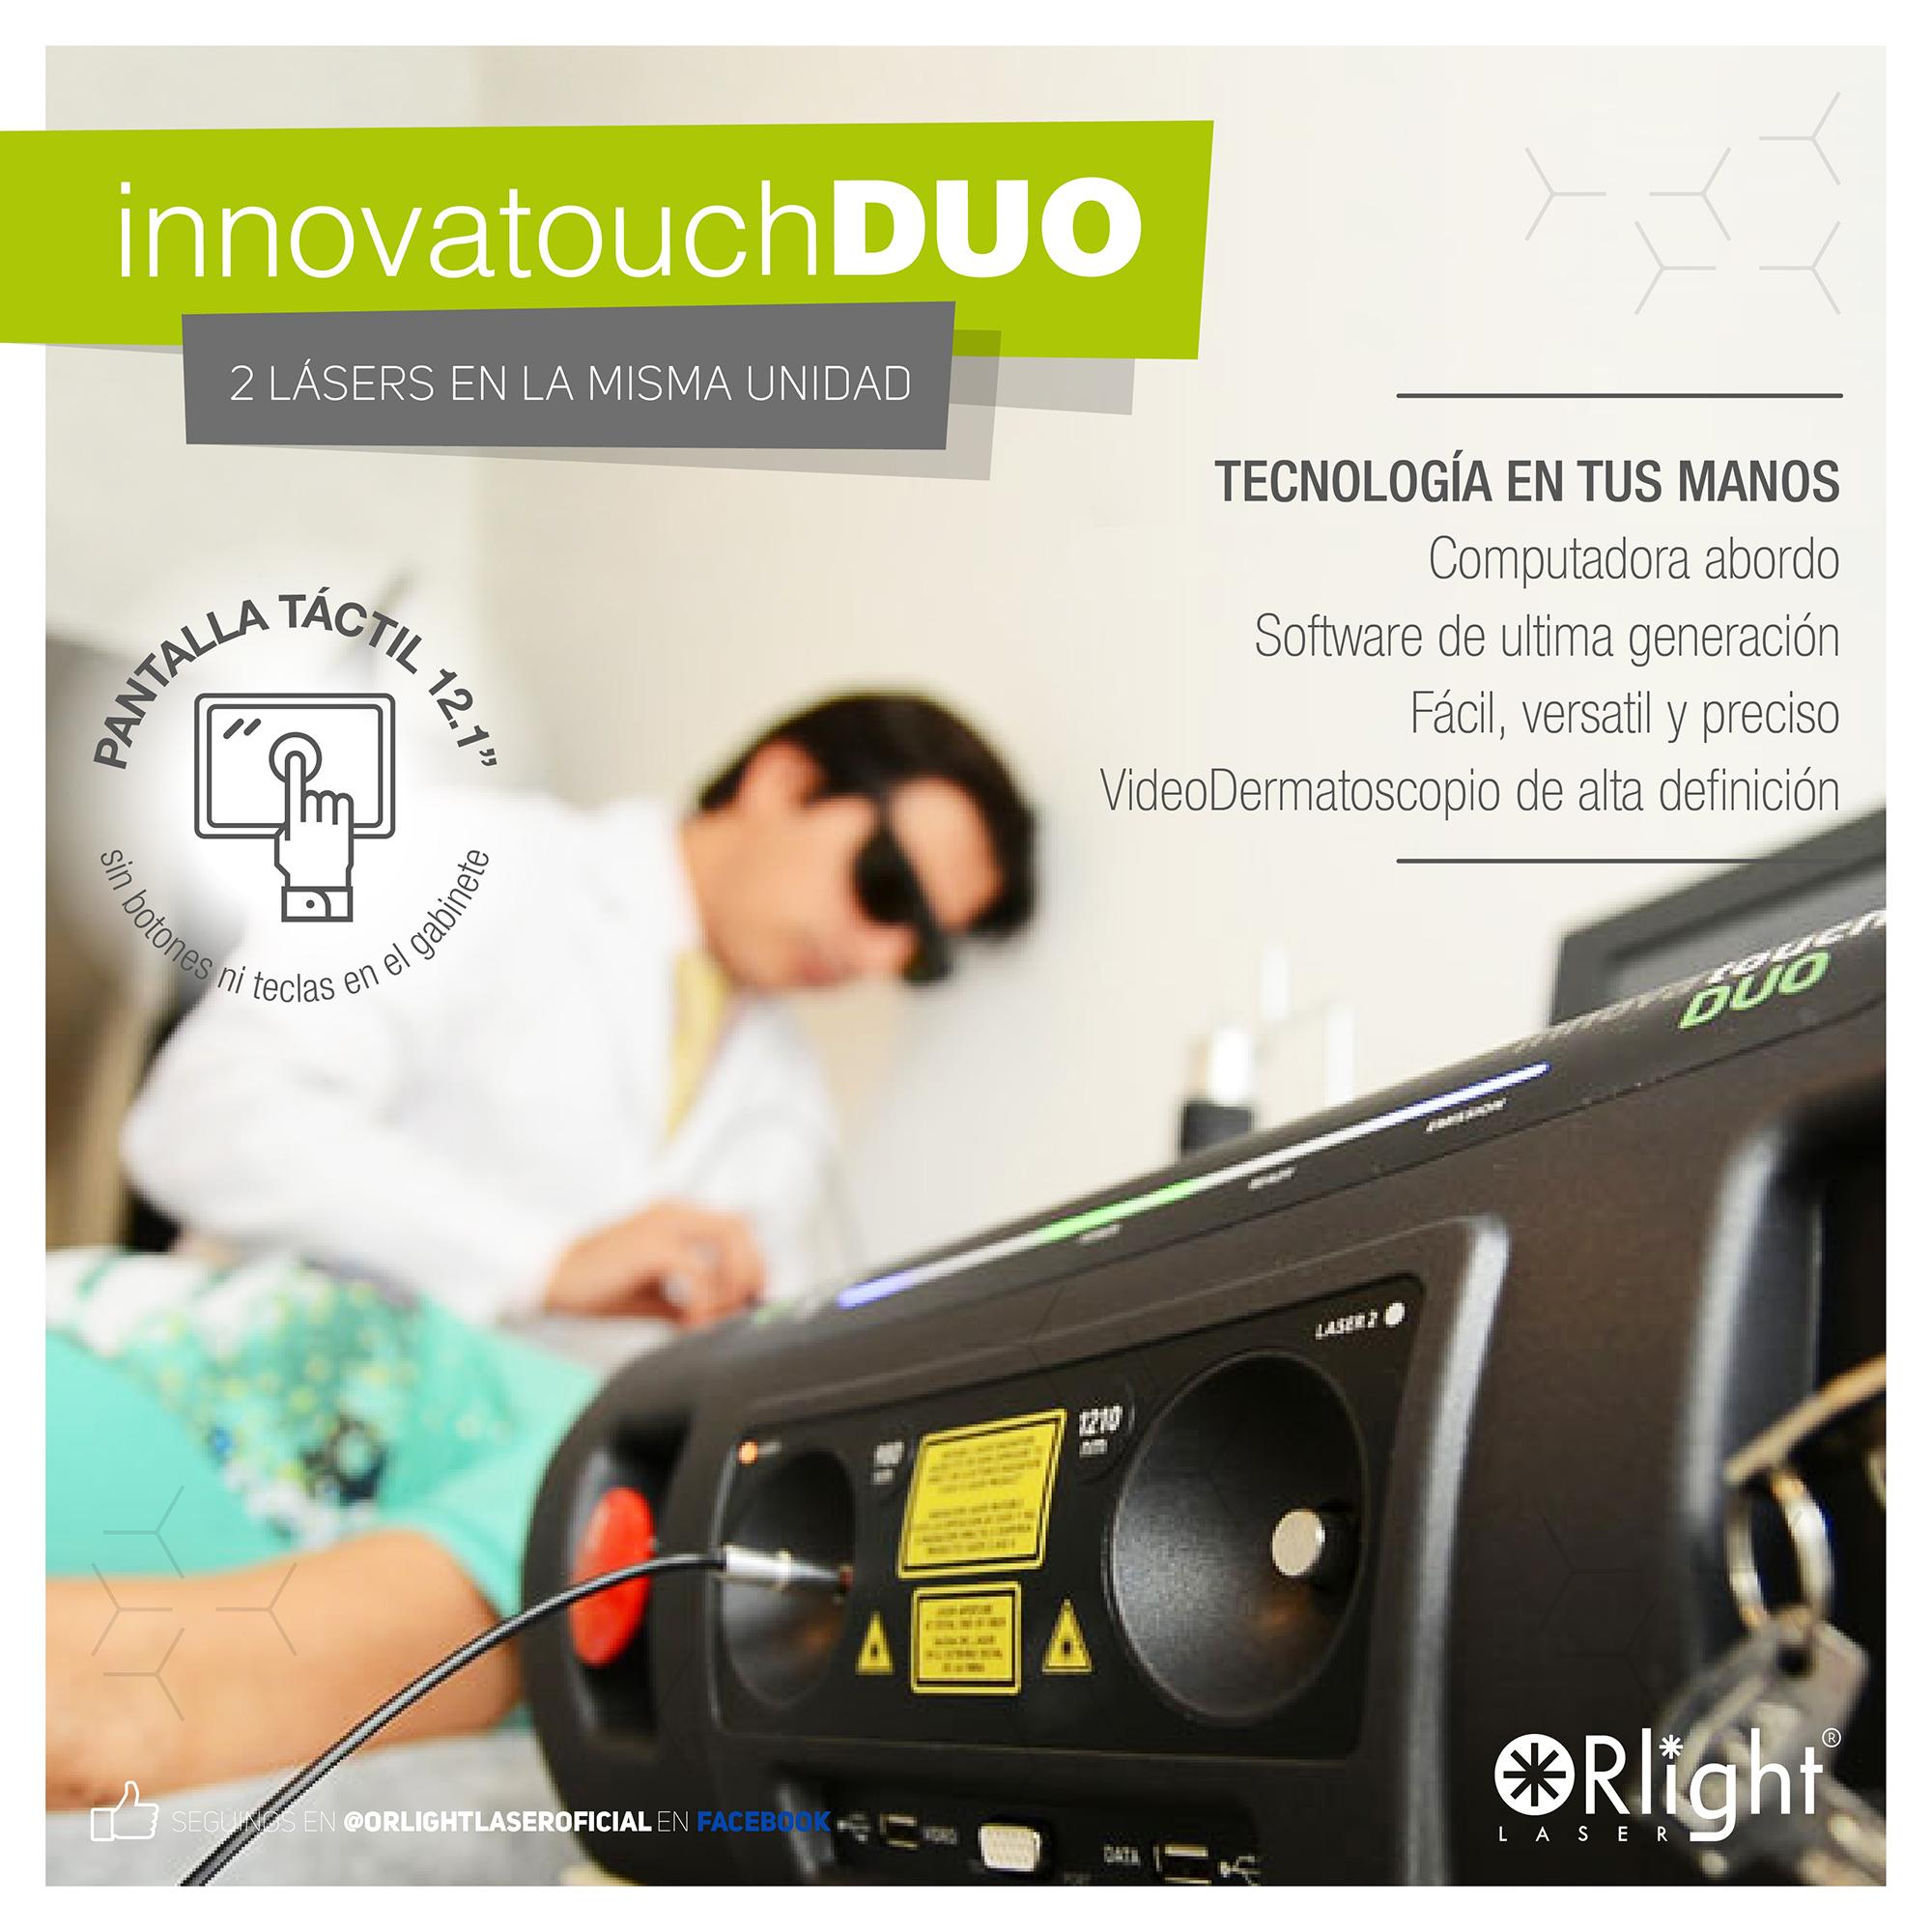 Innova Touch DUO - Tecnología en tus manos